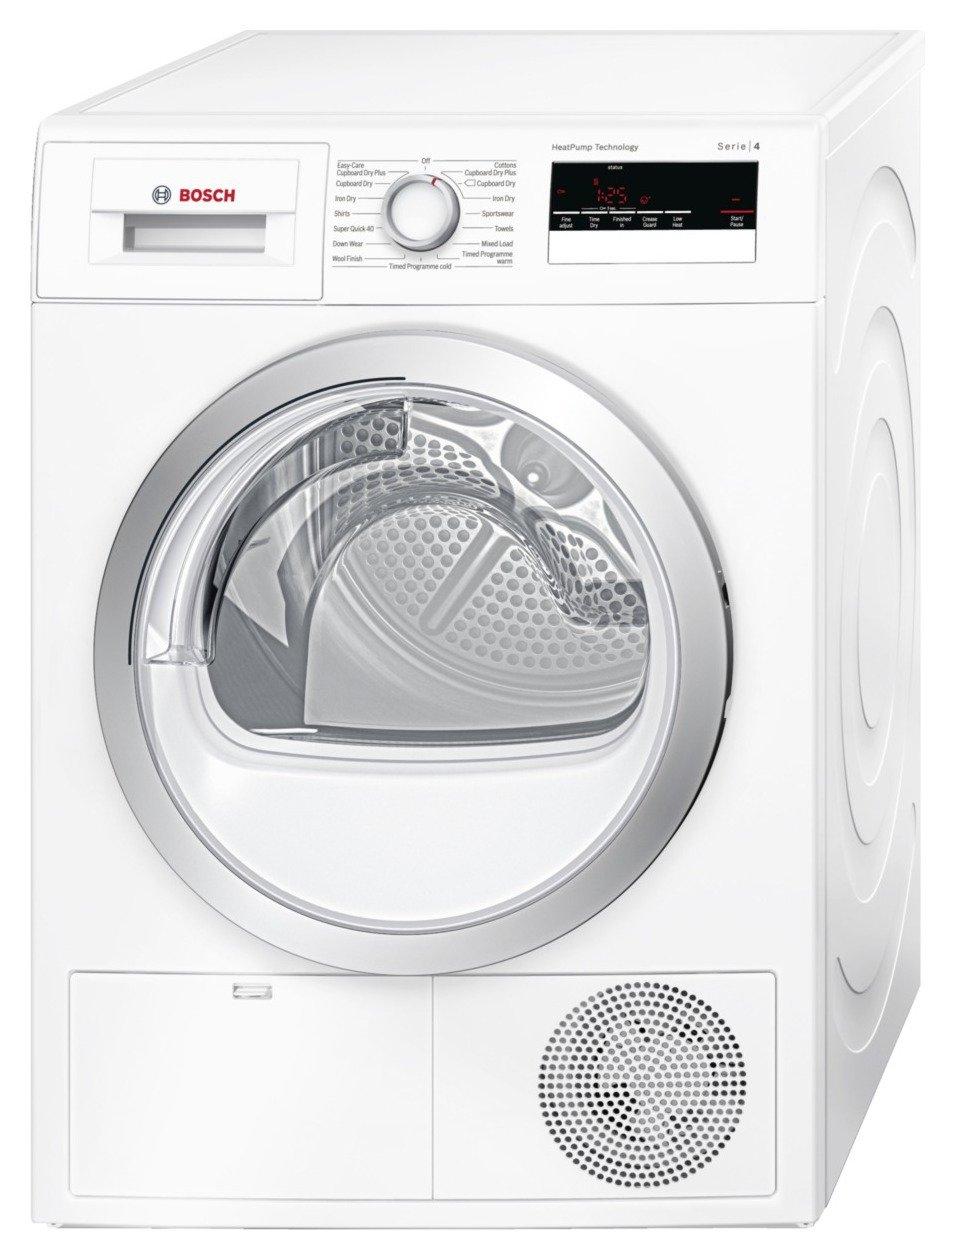 Bosch - WTH85200GB Condenser - Tumble Dryer - White